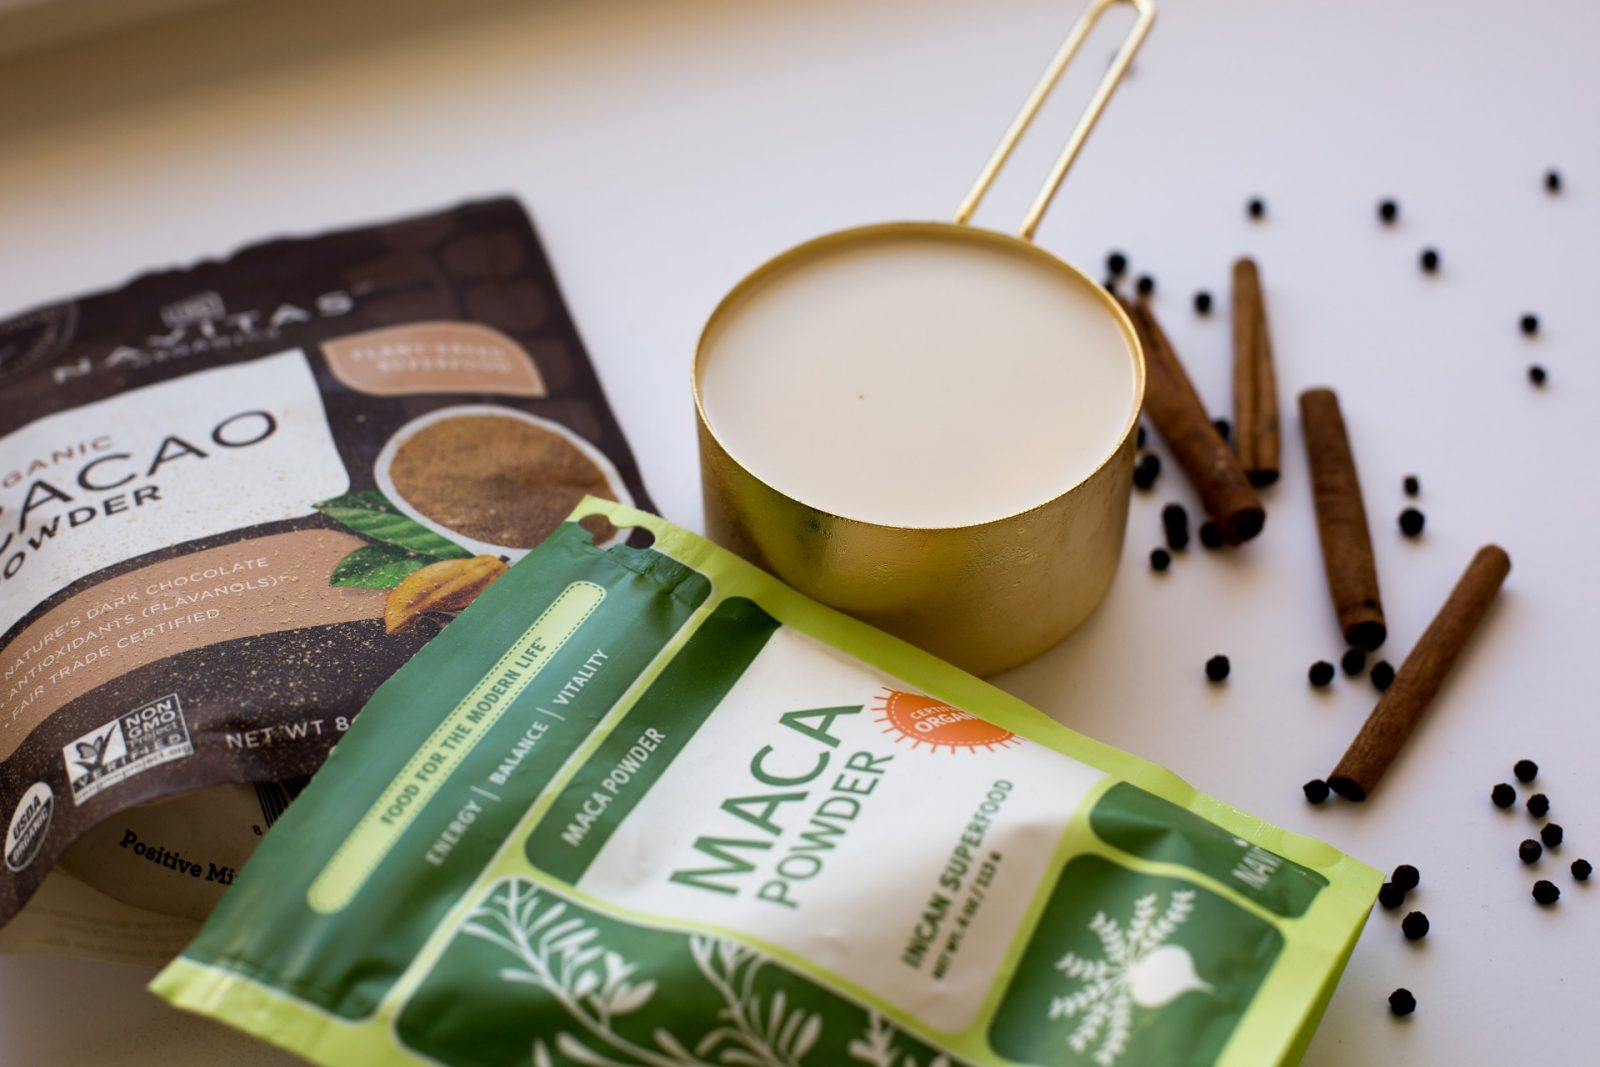 macaccino recipe, dairy free macaccino recipe, macaccino recipe maca cacao, maca cacao recipe, coffee free macaccino, dairy free macaccino